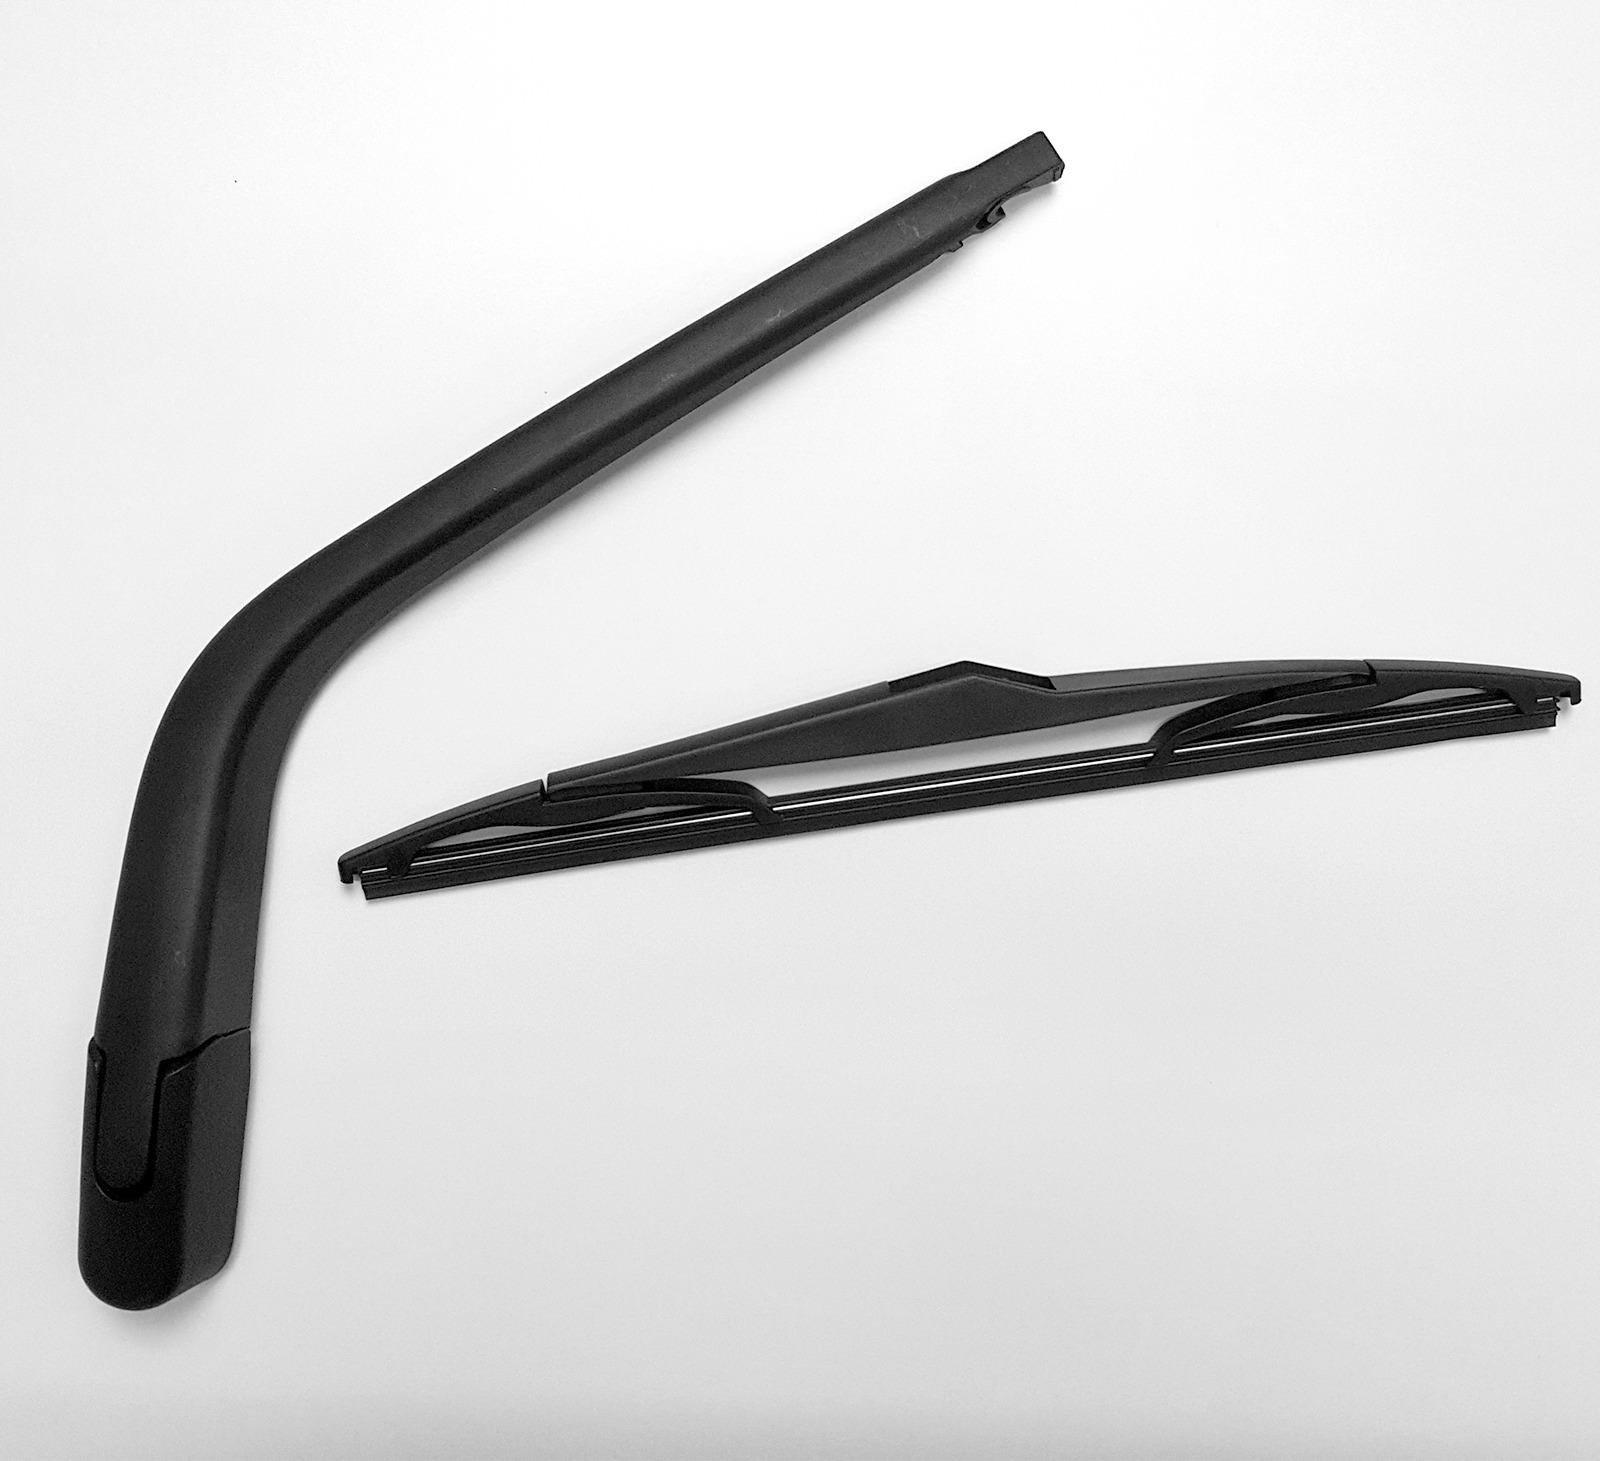 Hyundai I10 Rear Wiper Blade Specific Fit 12 Inch Yatesexterior Ca